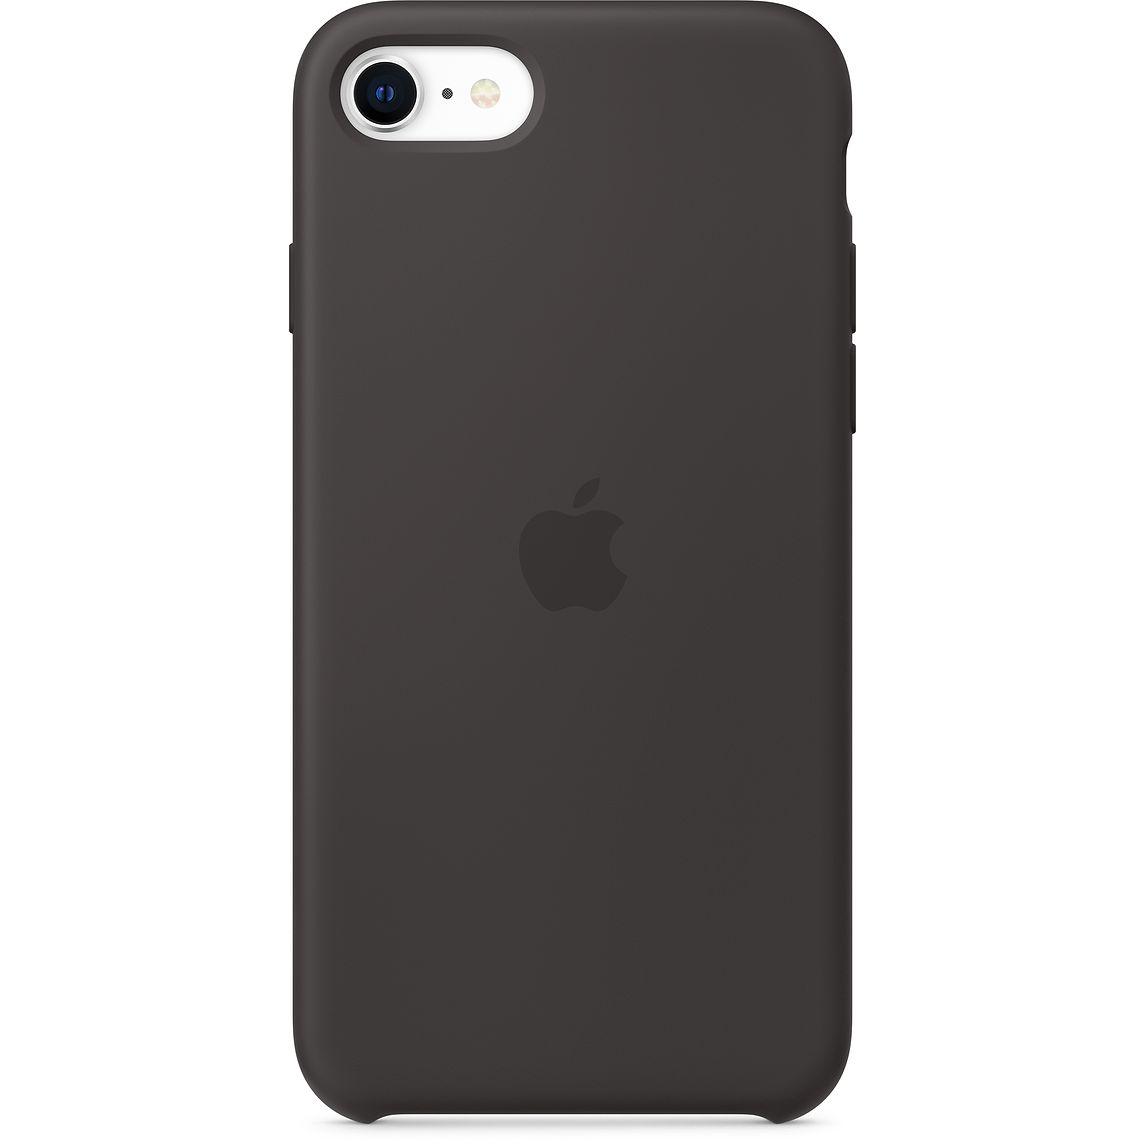 Apple iPhone SE Silicone Case Black (2020)